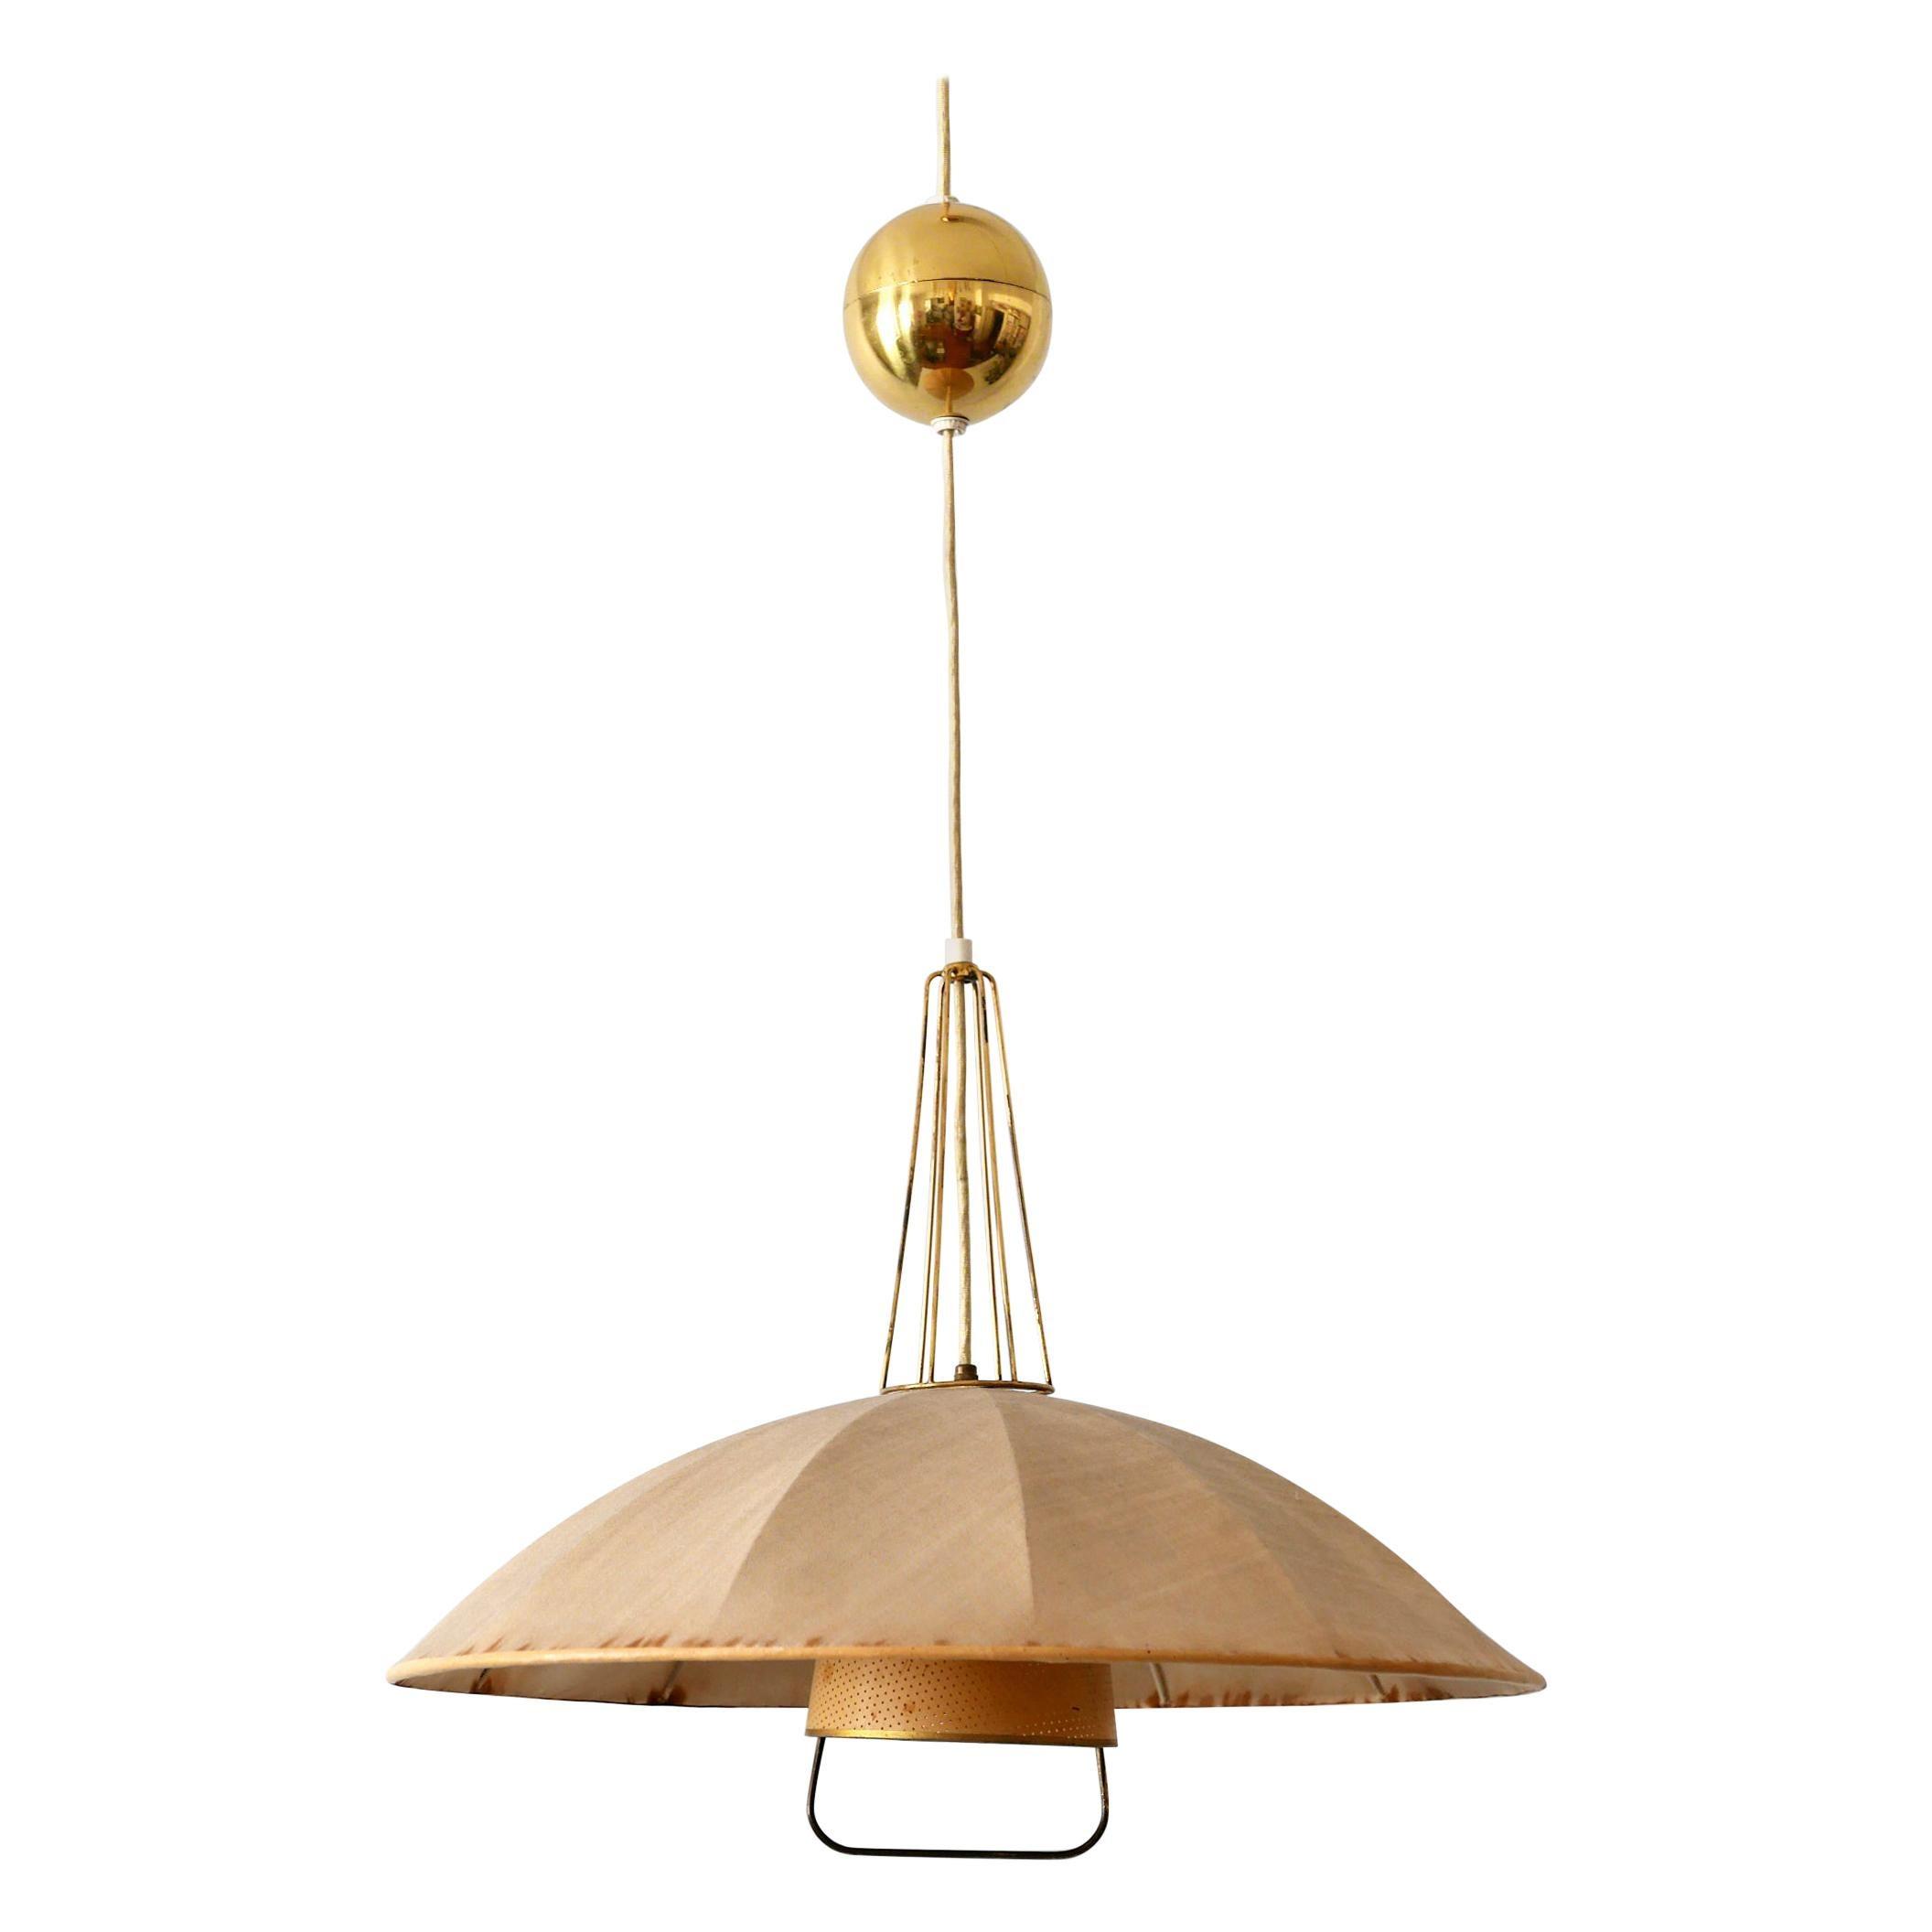 Mid-Century Modern Adjustable Counterweight Pendant Lamp or Hanging Light, 1950s